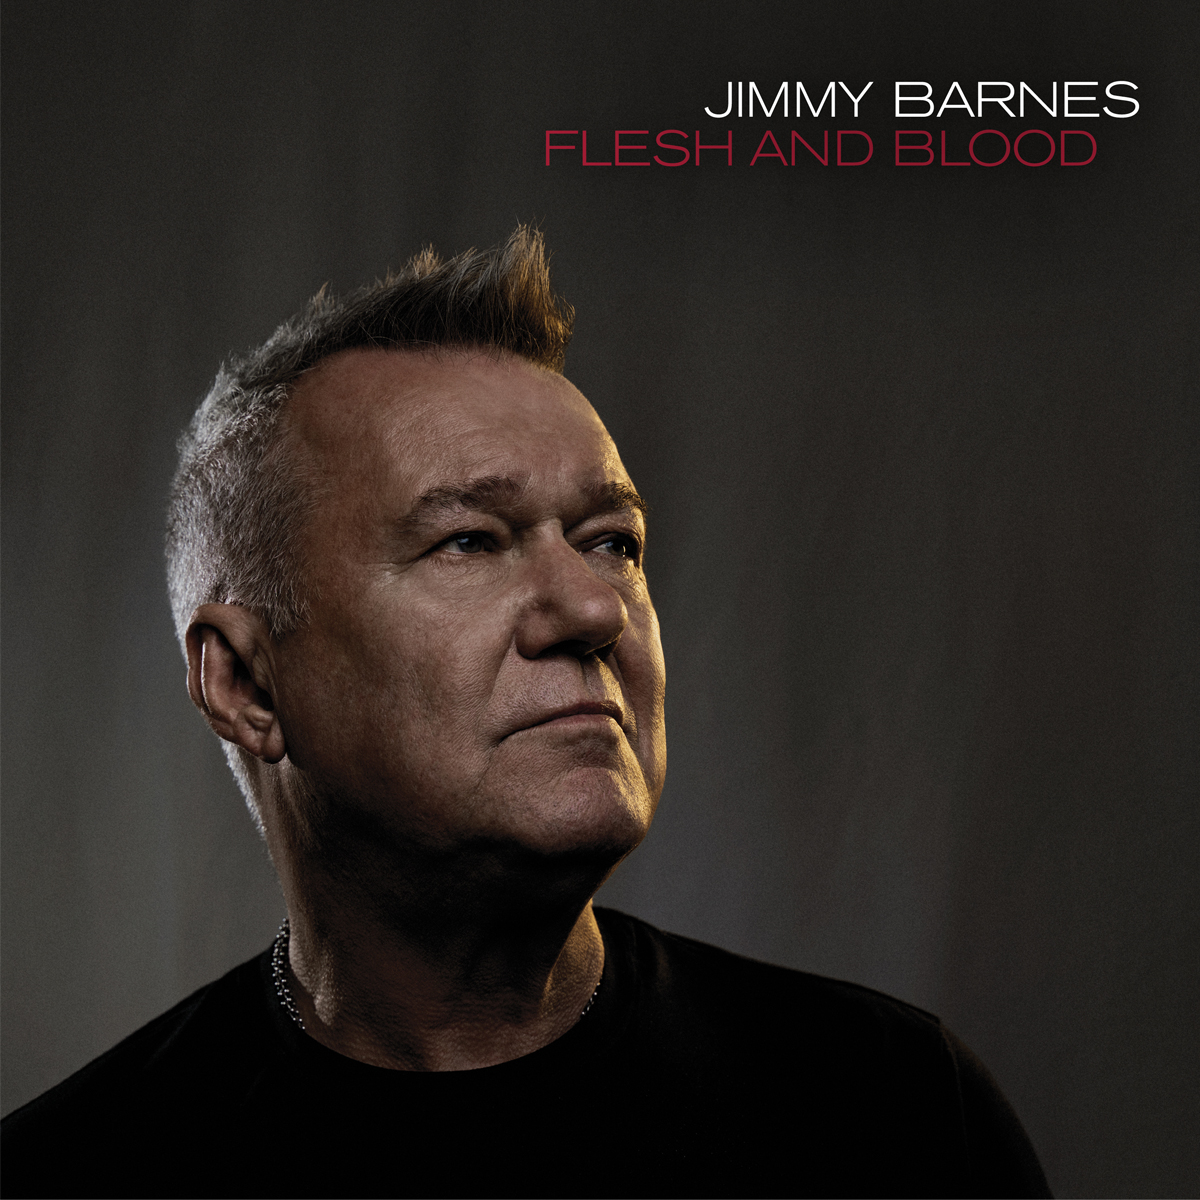 Jimmy Barnes Flesh and Blood album 2021